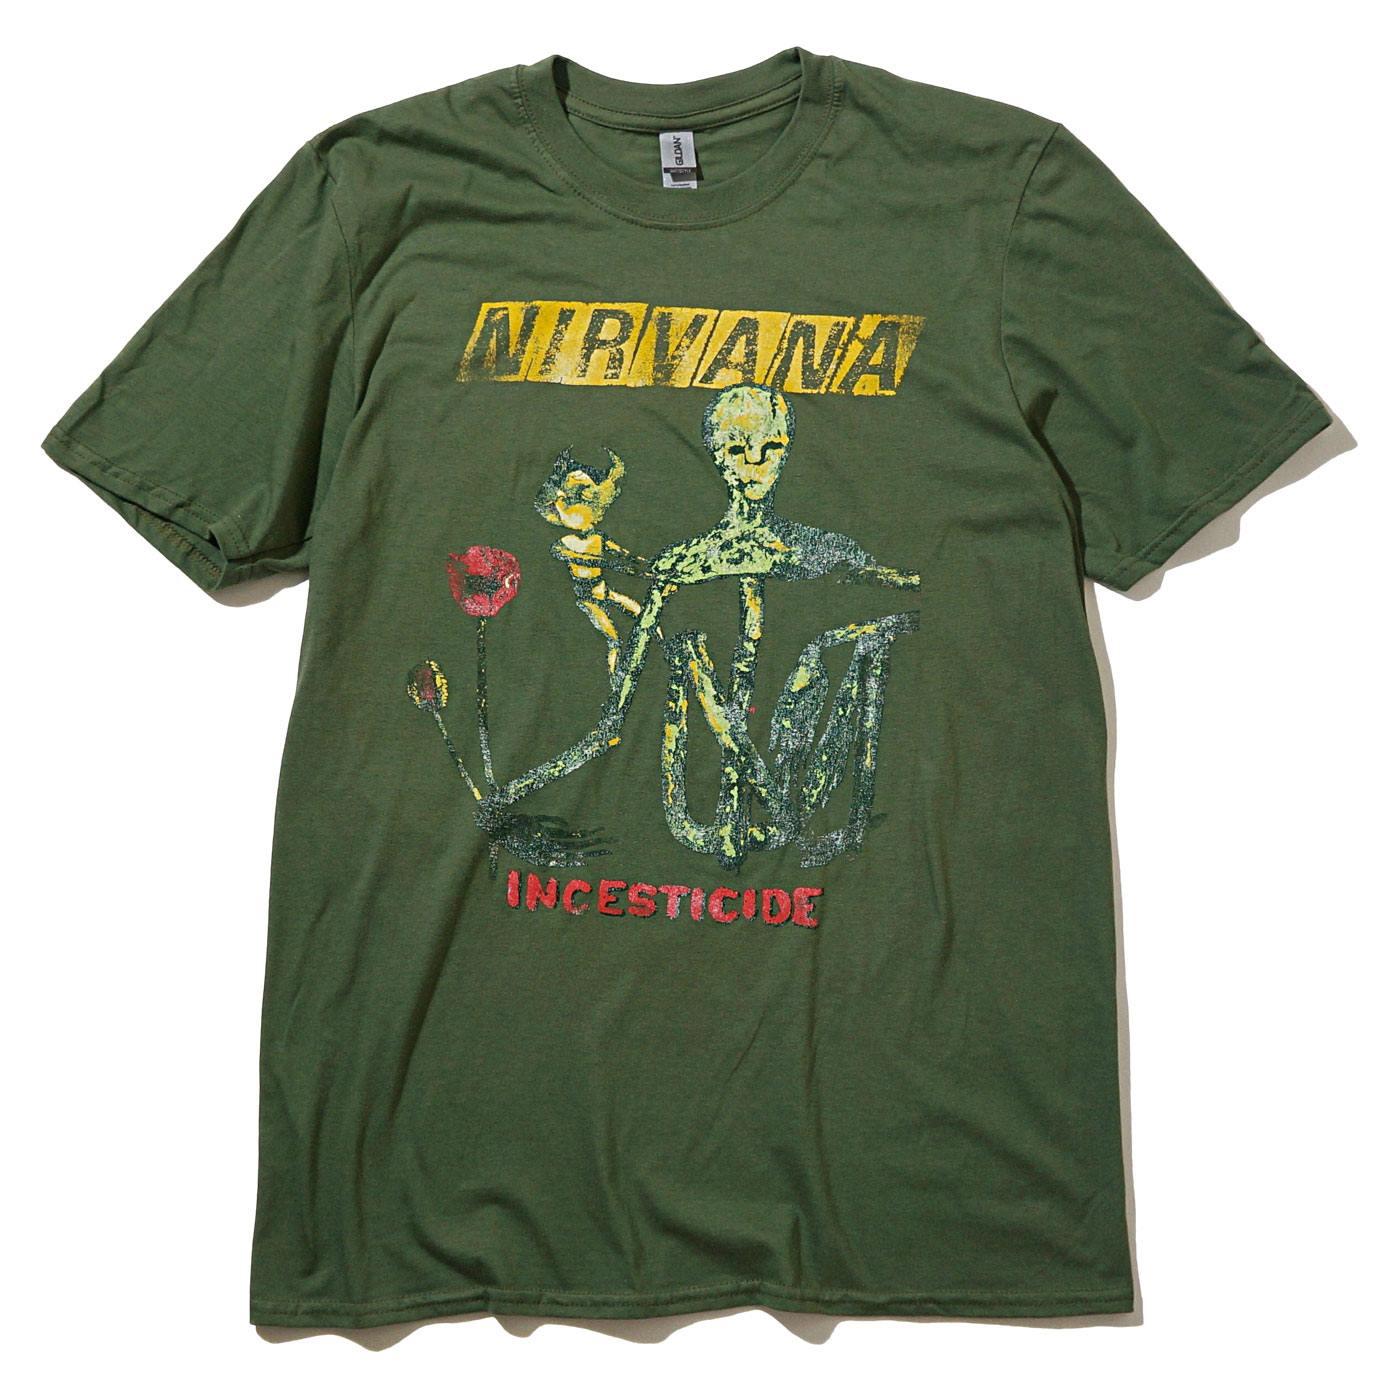 NIRVANA Tシャツ Reformant Incesticide-Green